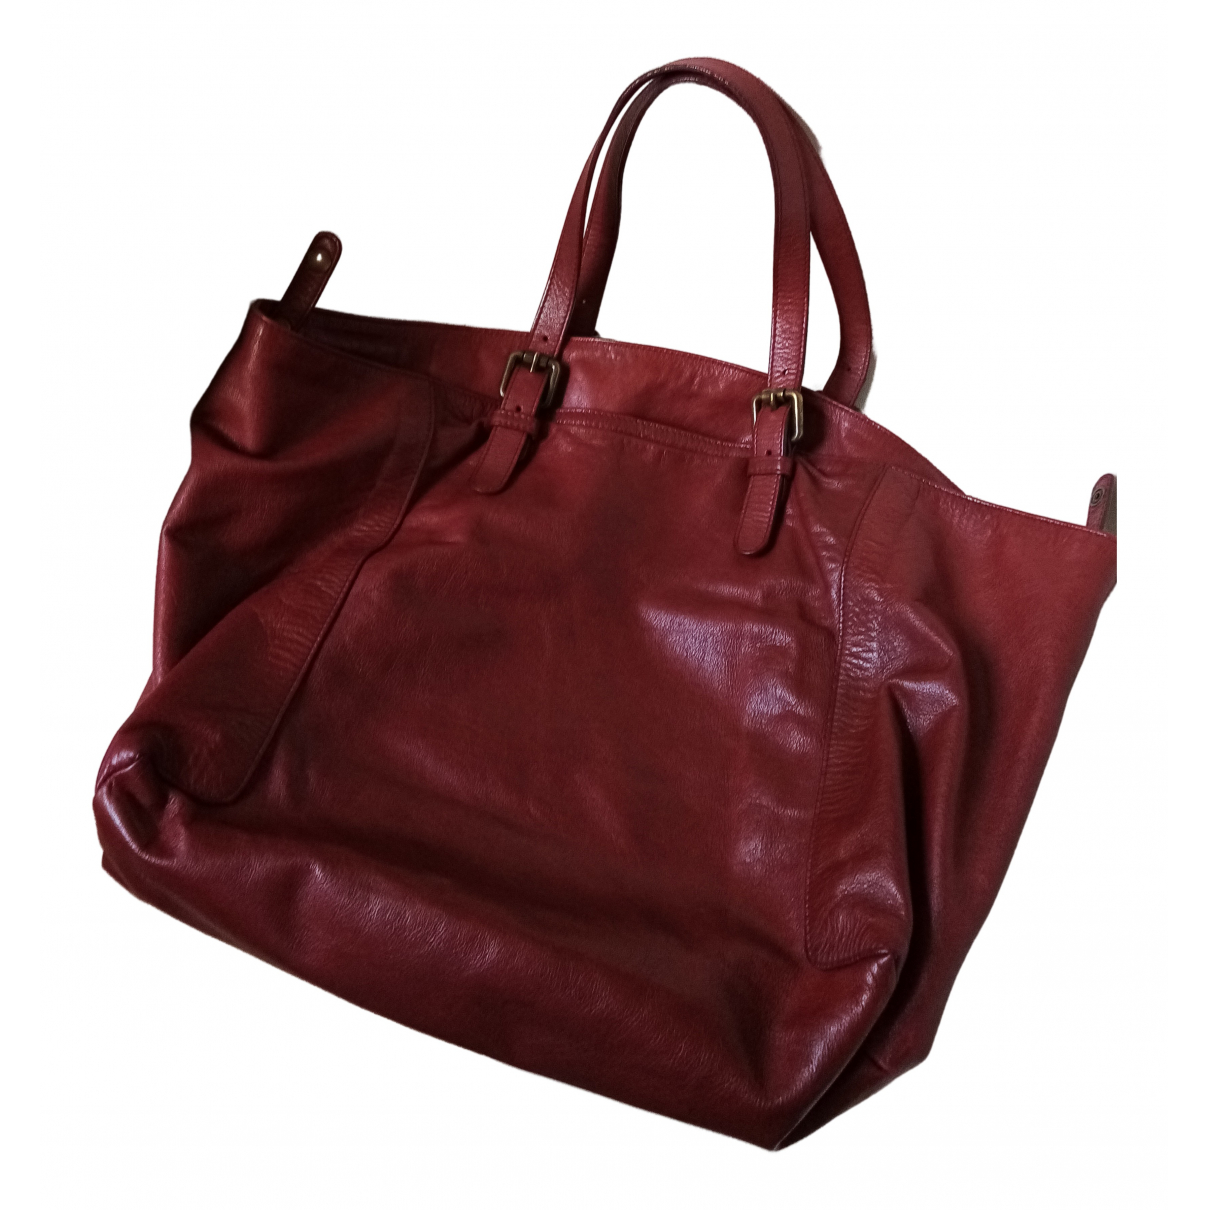 Gerard Darel Simple Bag Handtasche in  Bordeauxrot Leder